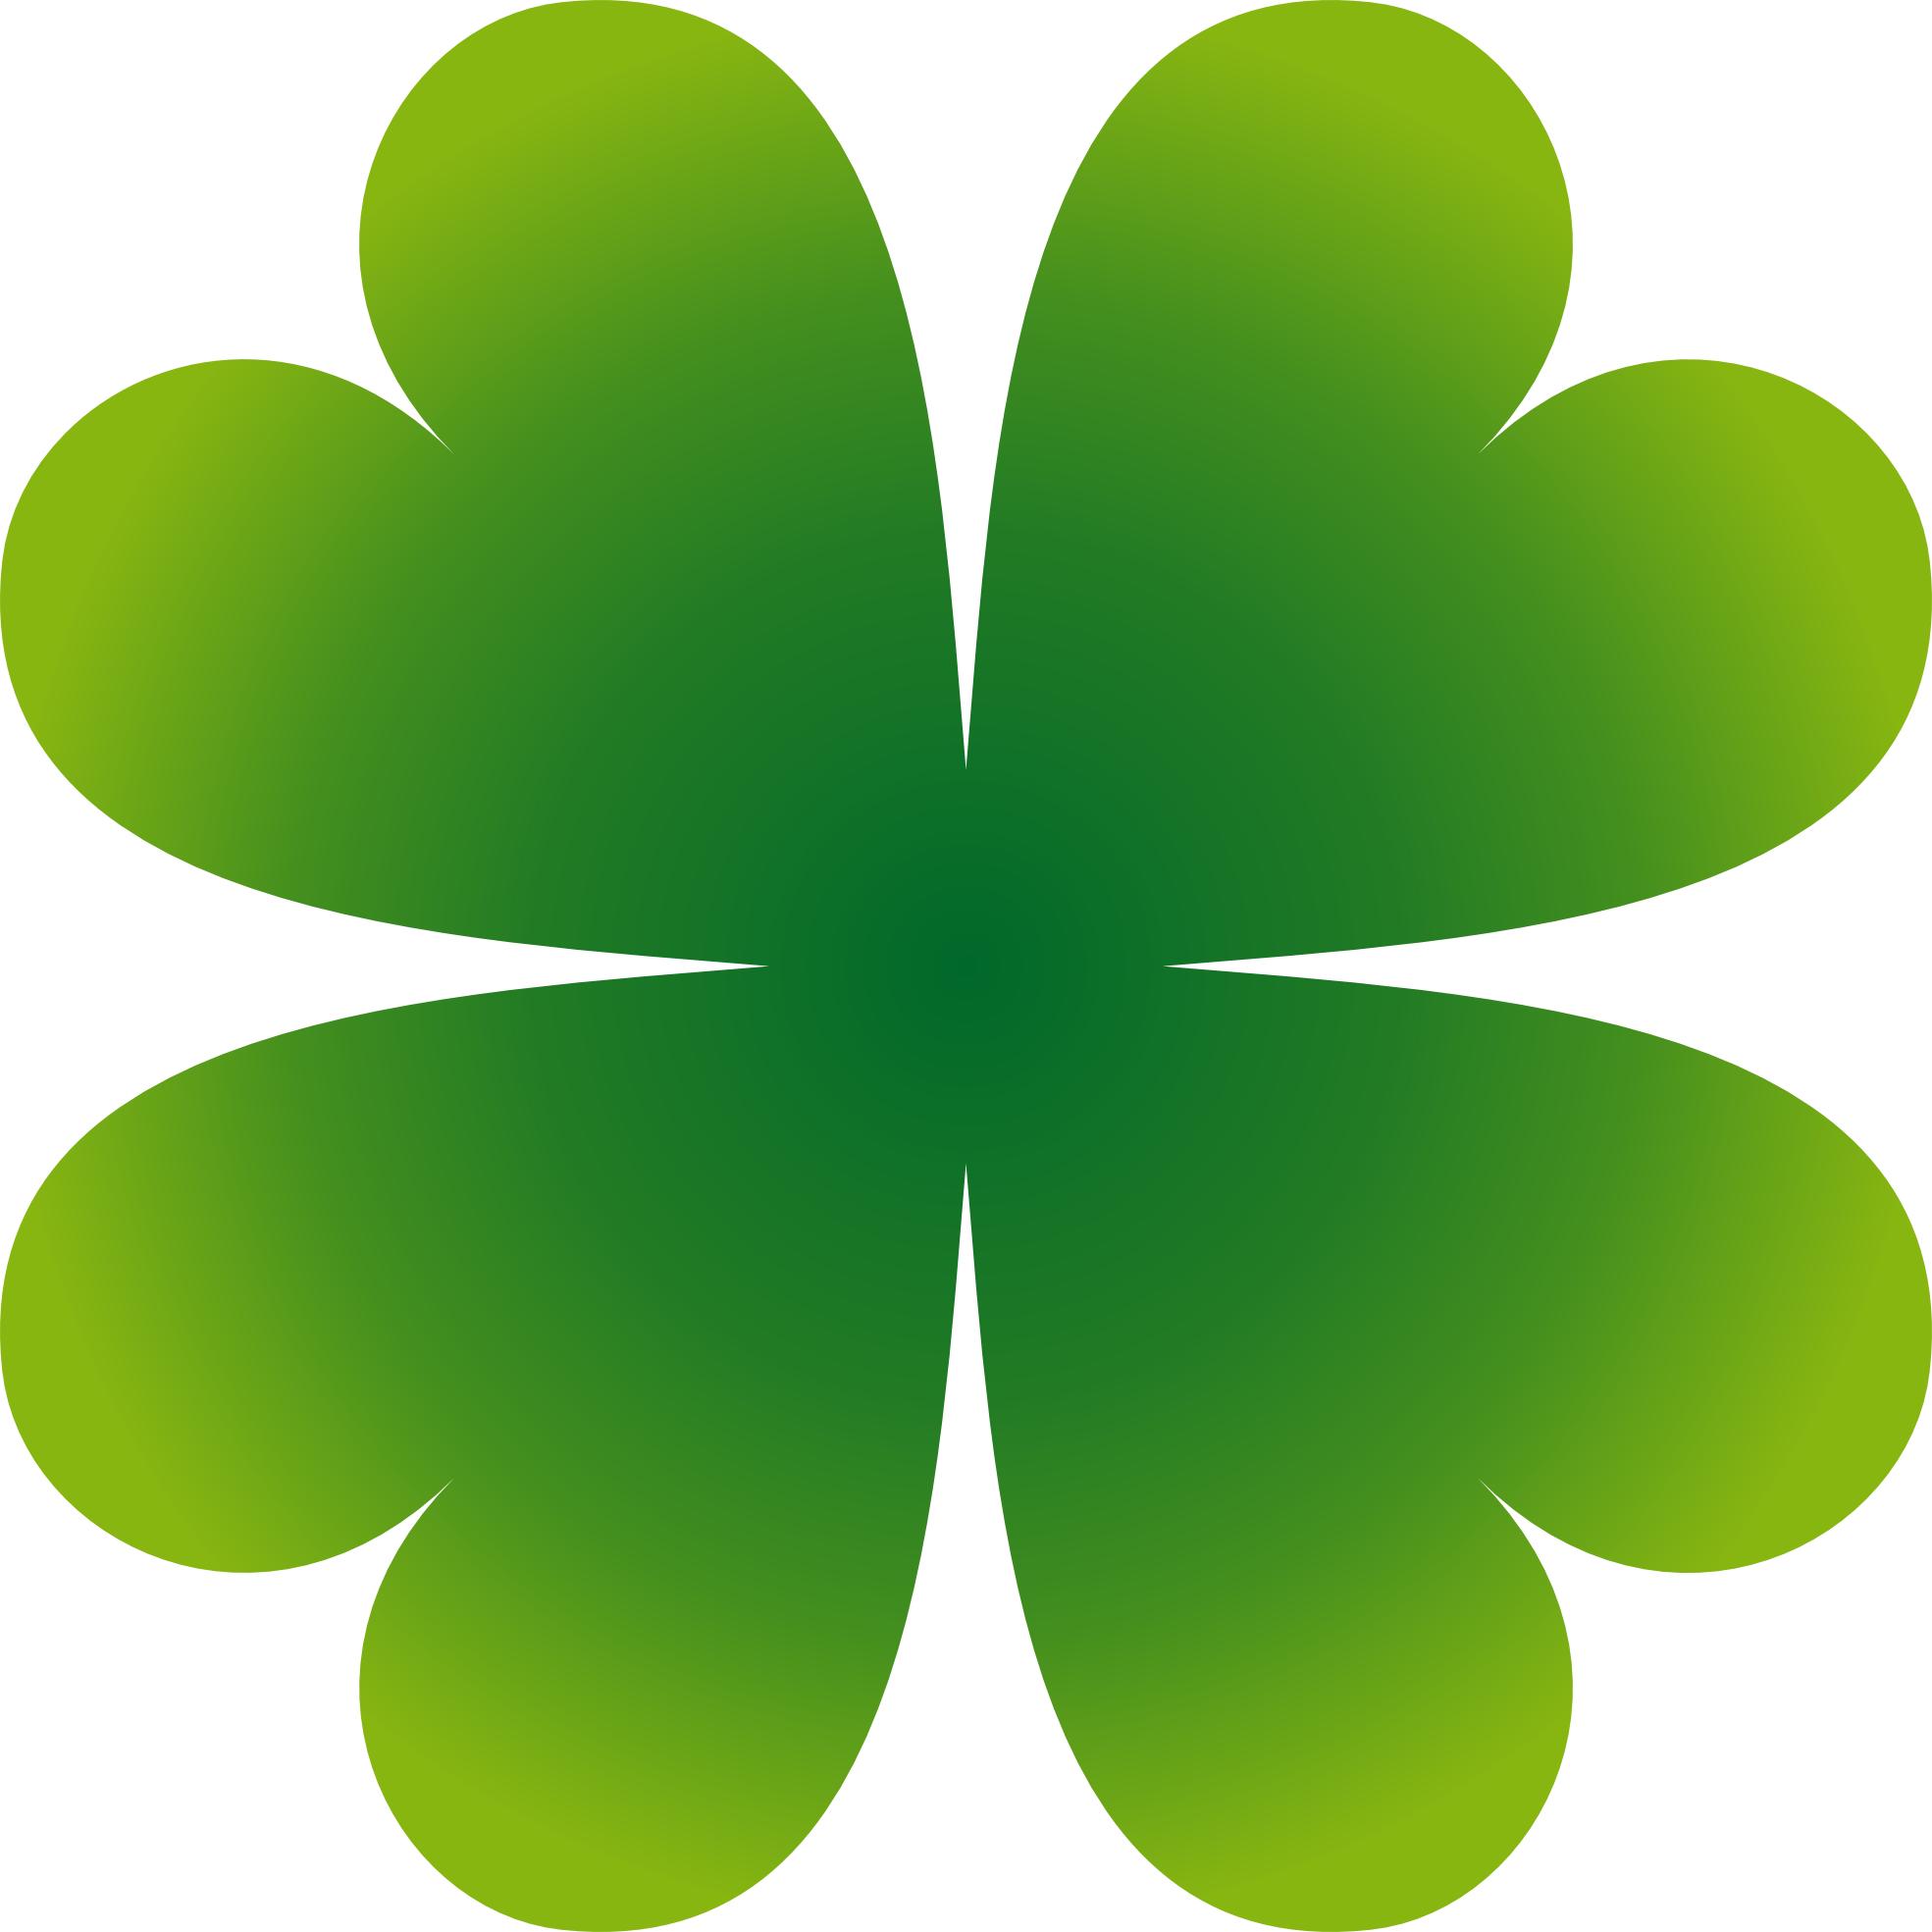 Saint Pattys Day four Leaf Clover 1 xochi.info scallywag Flower.